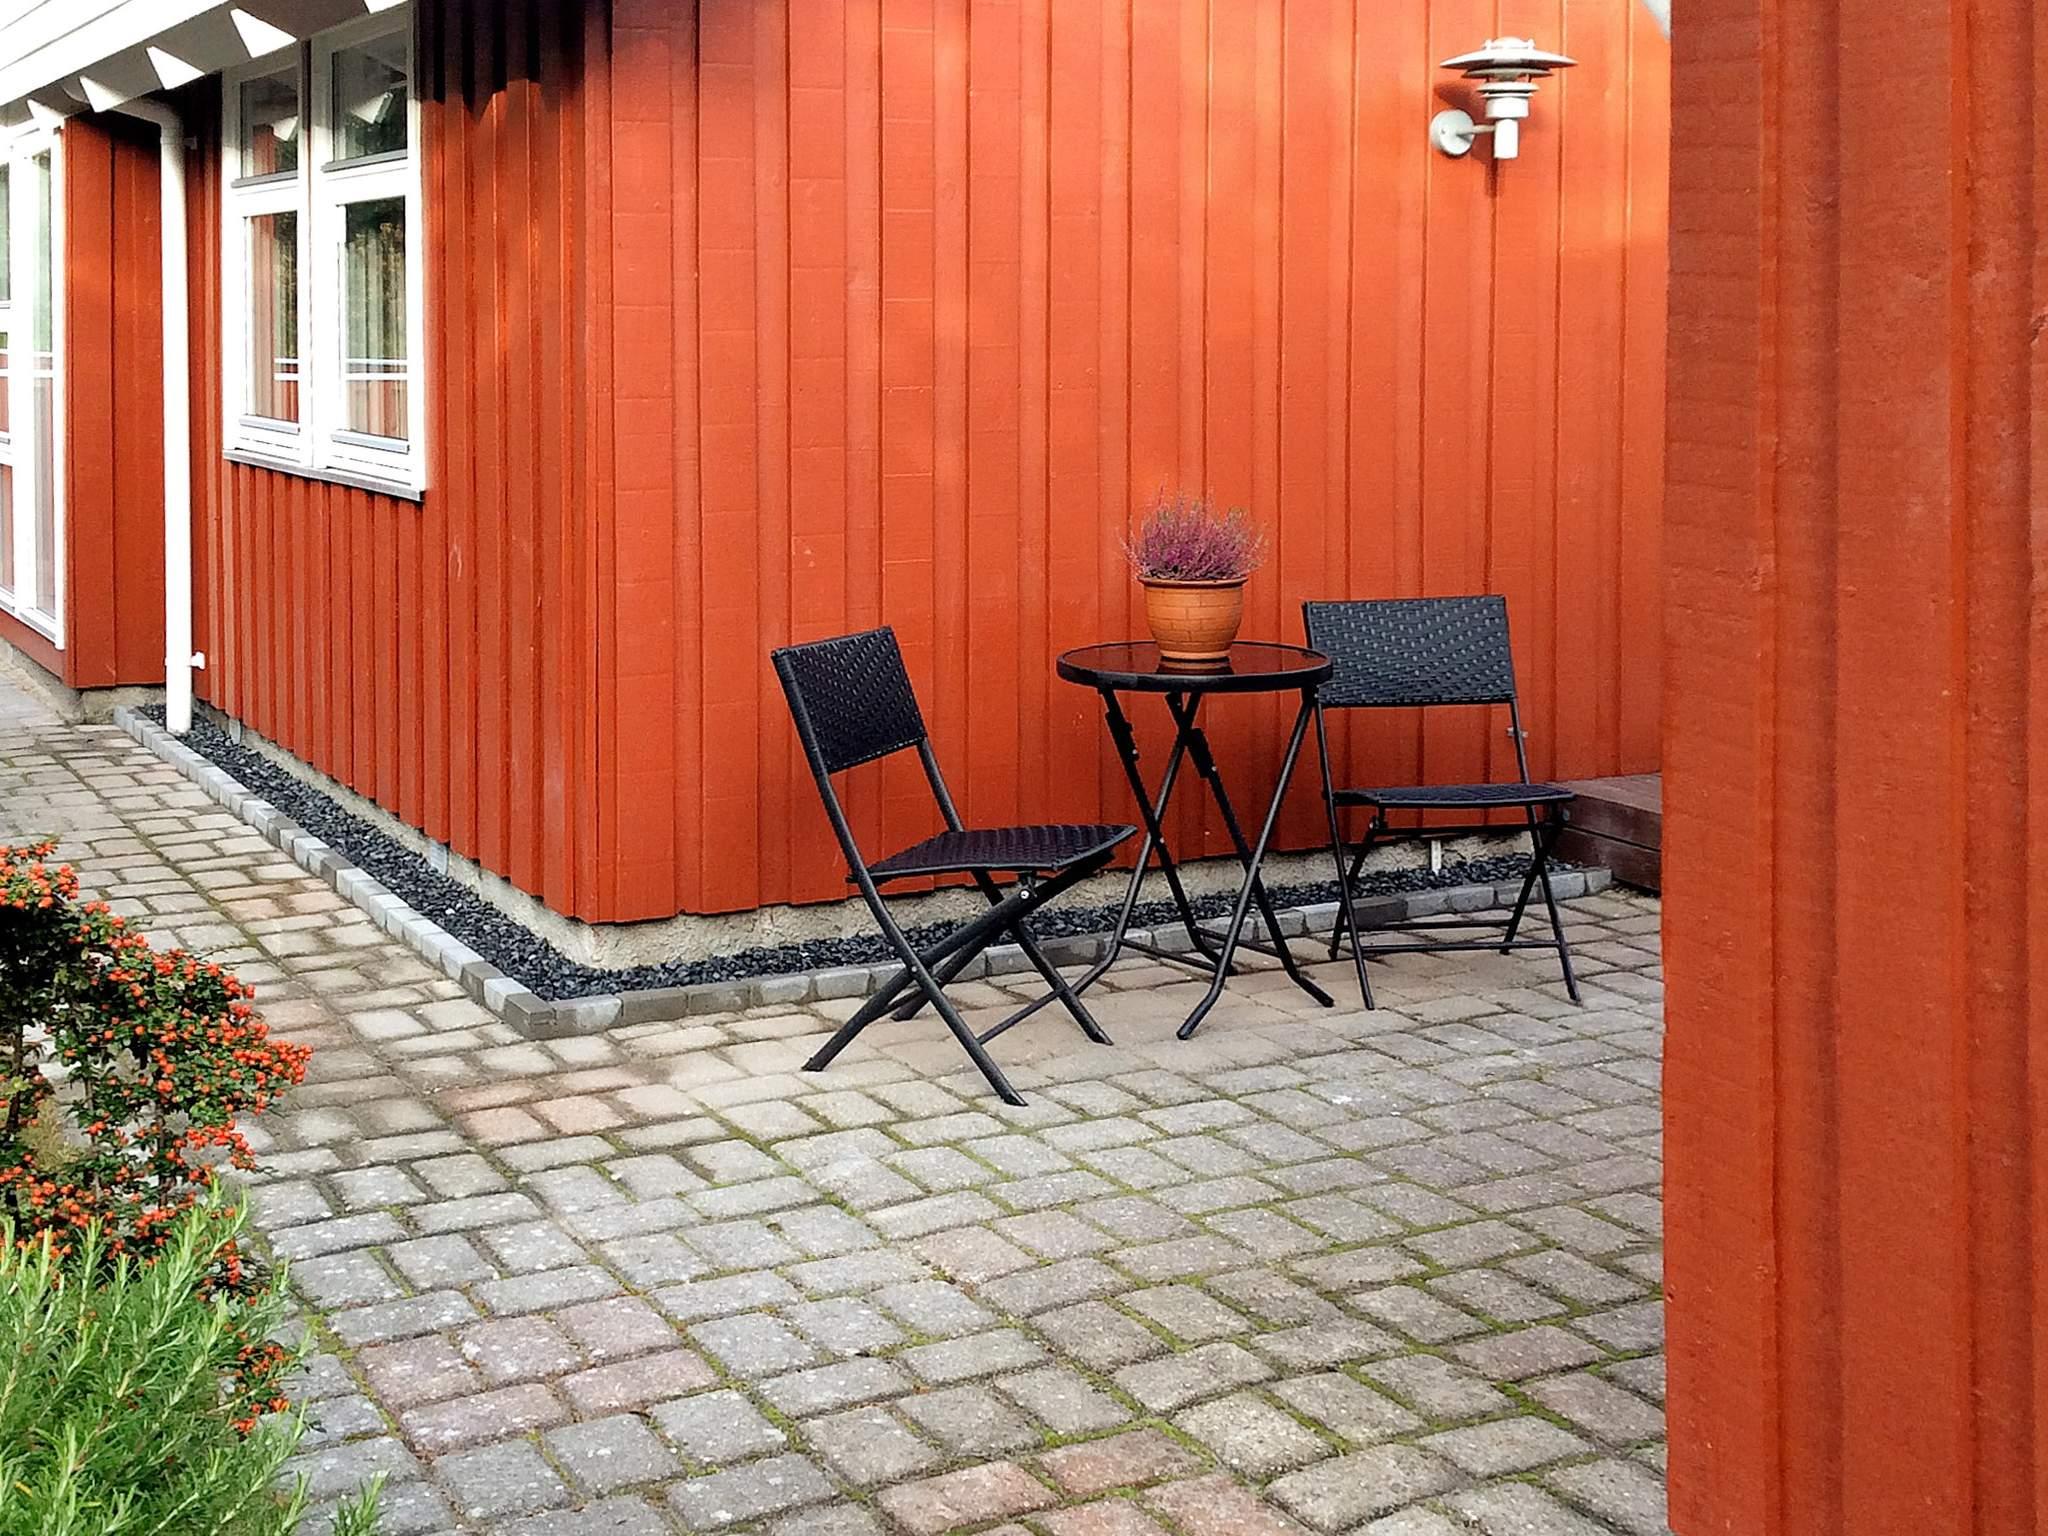 Ferienhaus Øster Hurup (83254), Øster Hurup, , Ostjütland, Dänemark, Bild 19